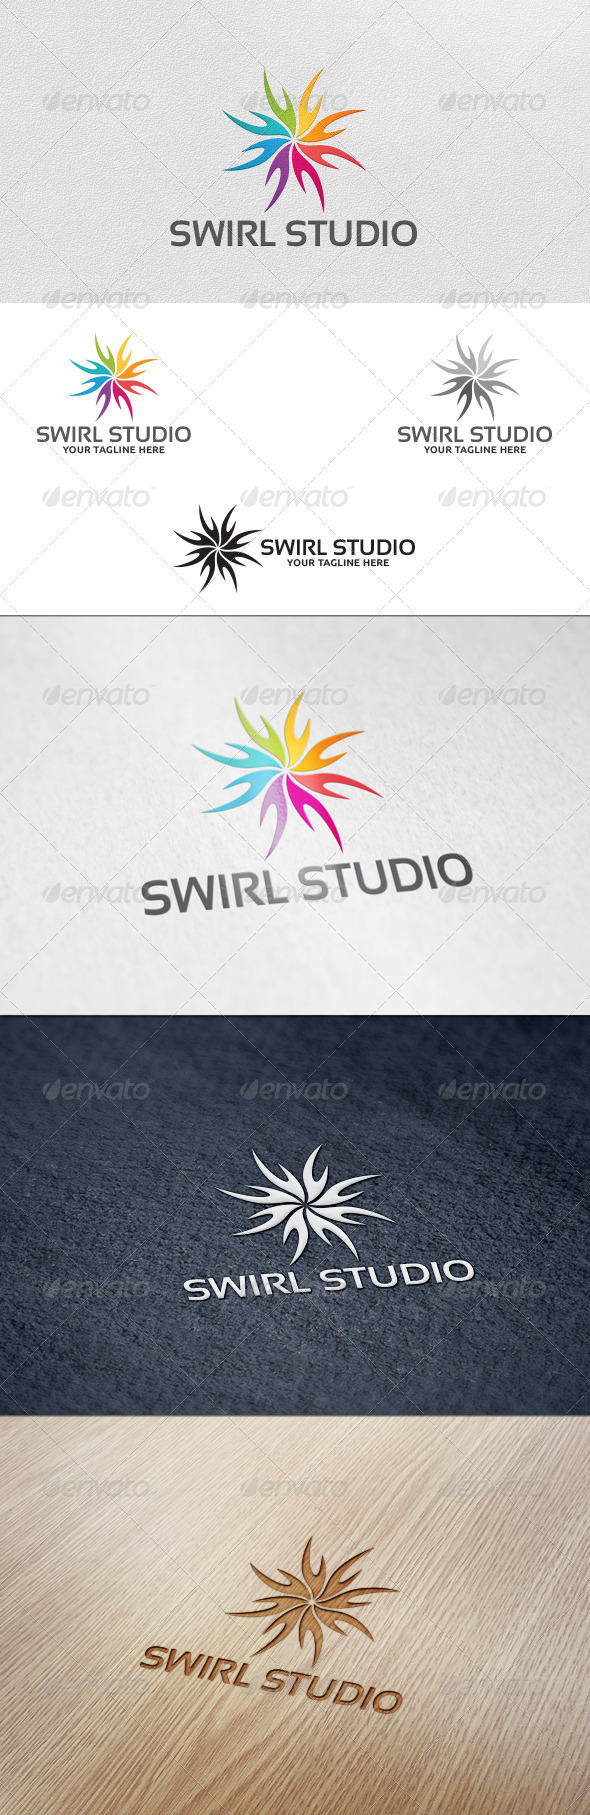 Swirl Studio - Logo Template